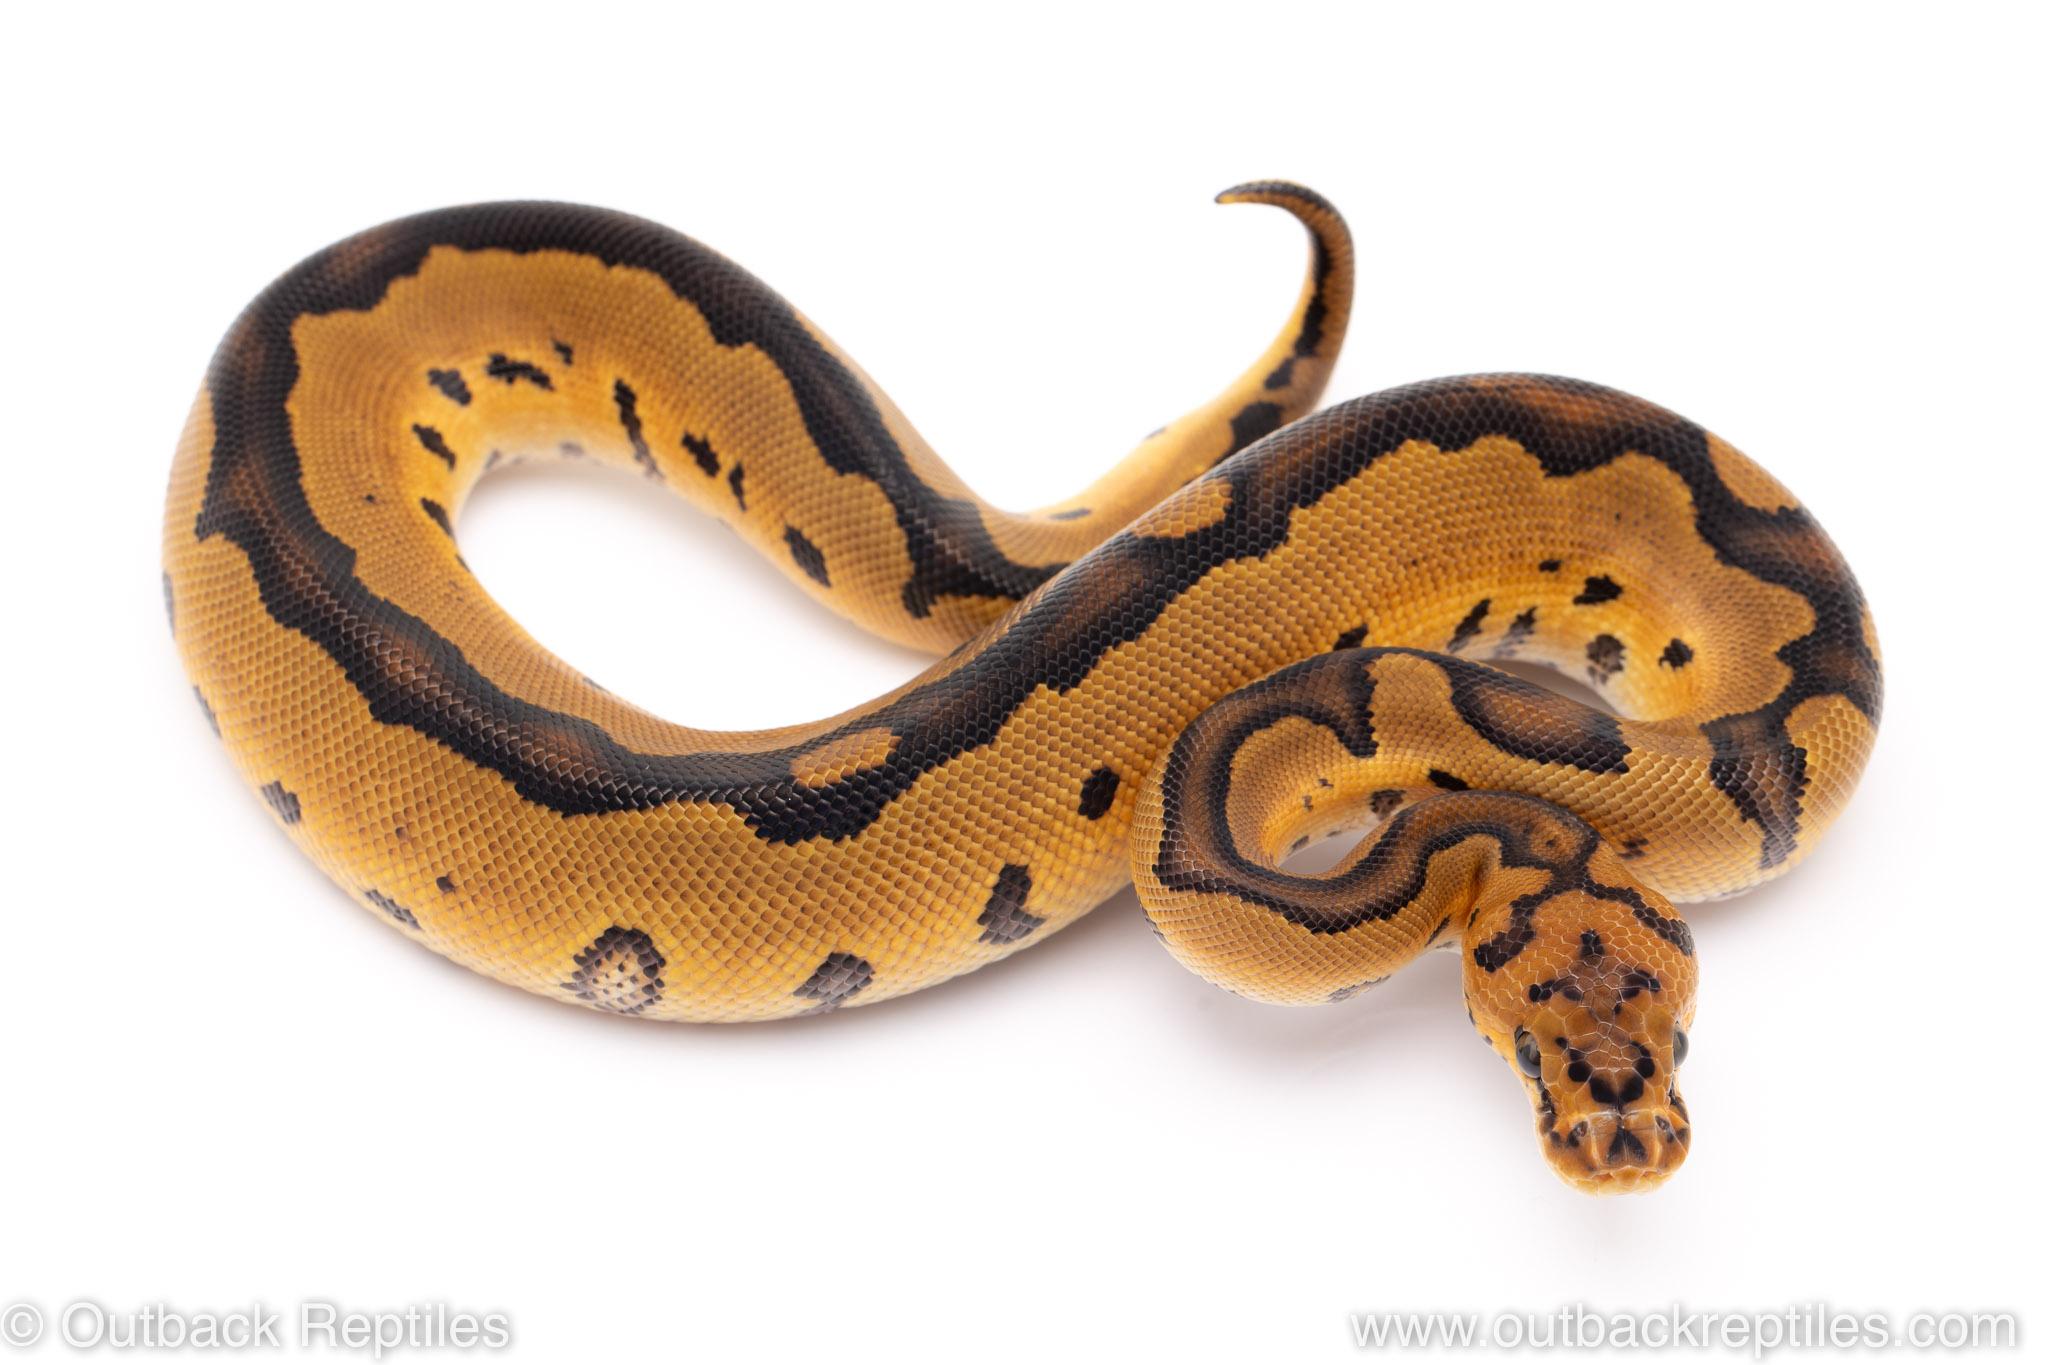 clown ball python for sale